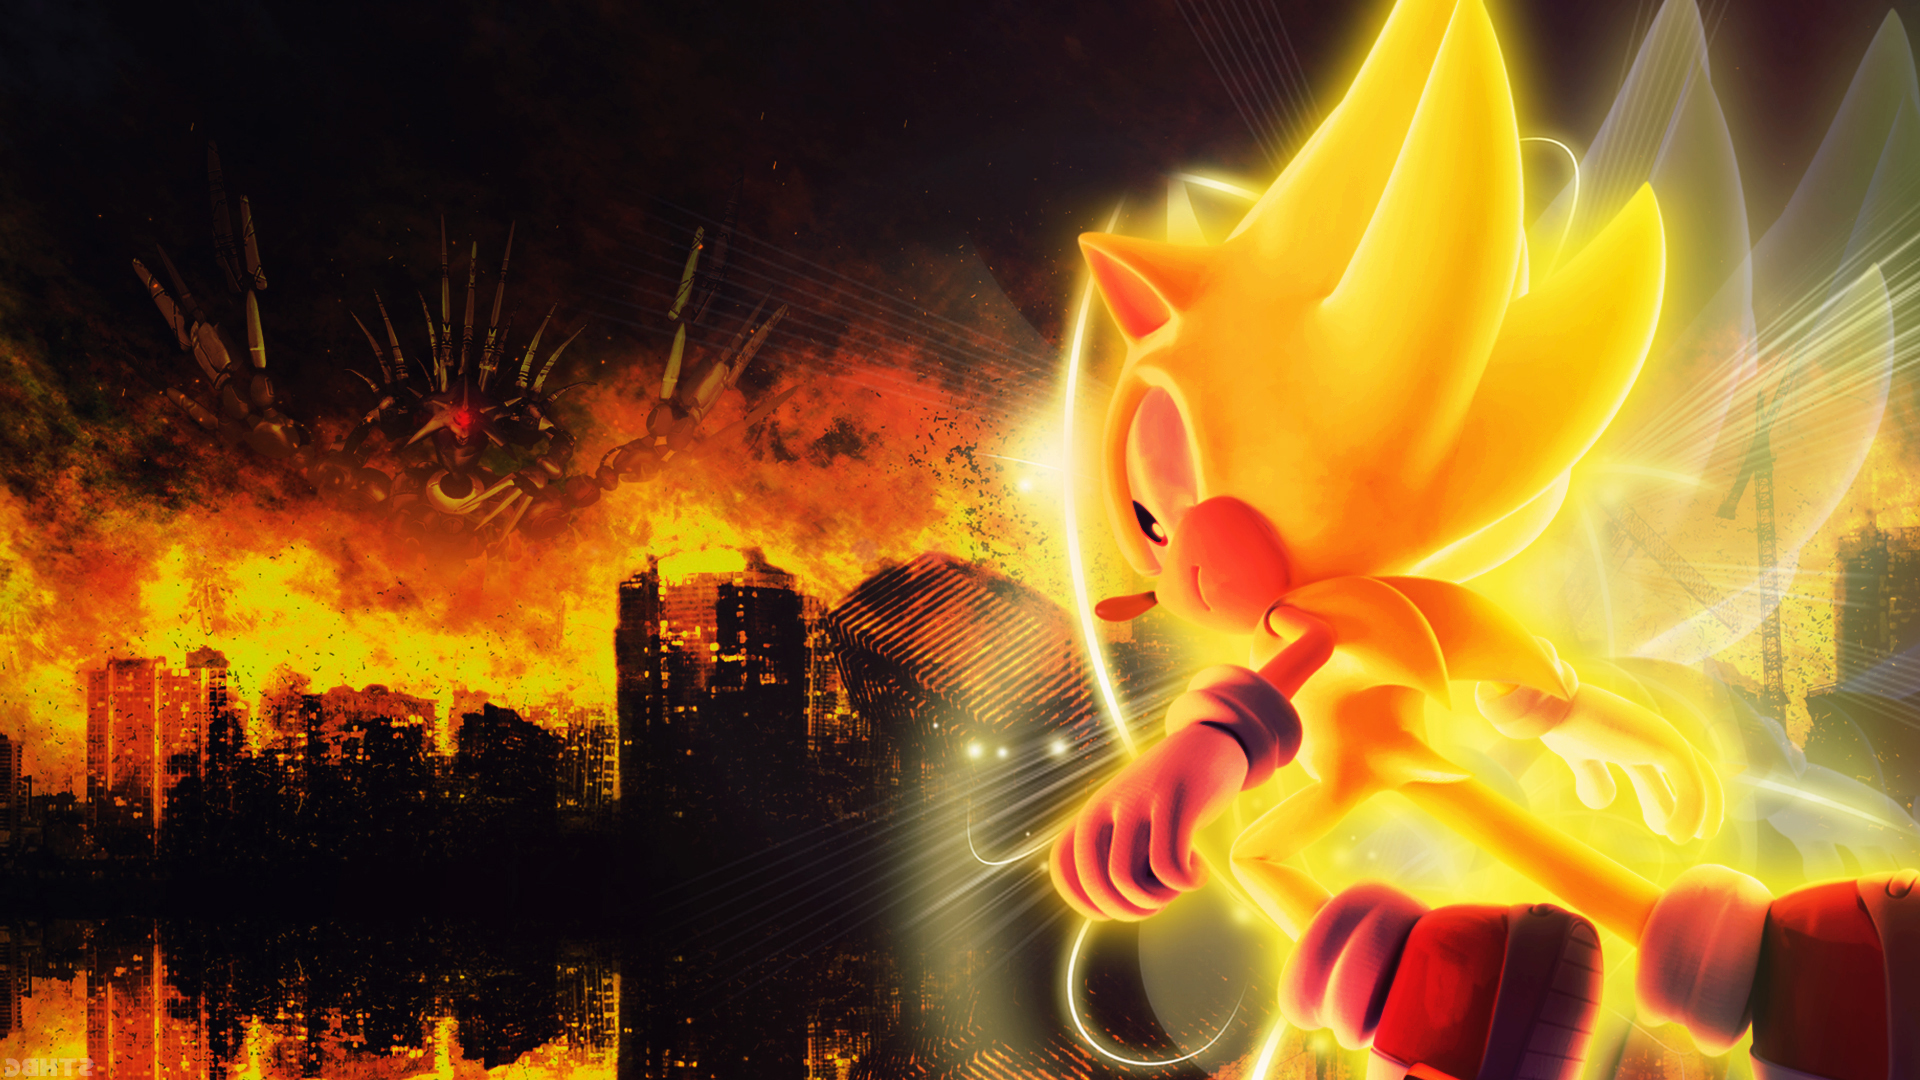 Super Sonic Hd Wallpaper Background Image 1920x1080 Id